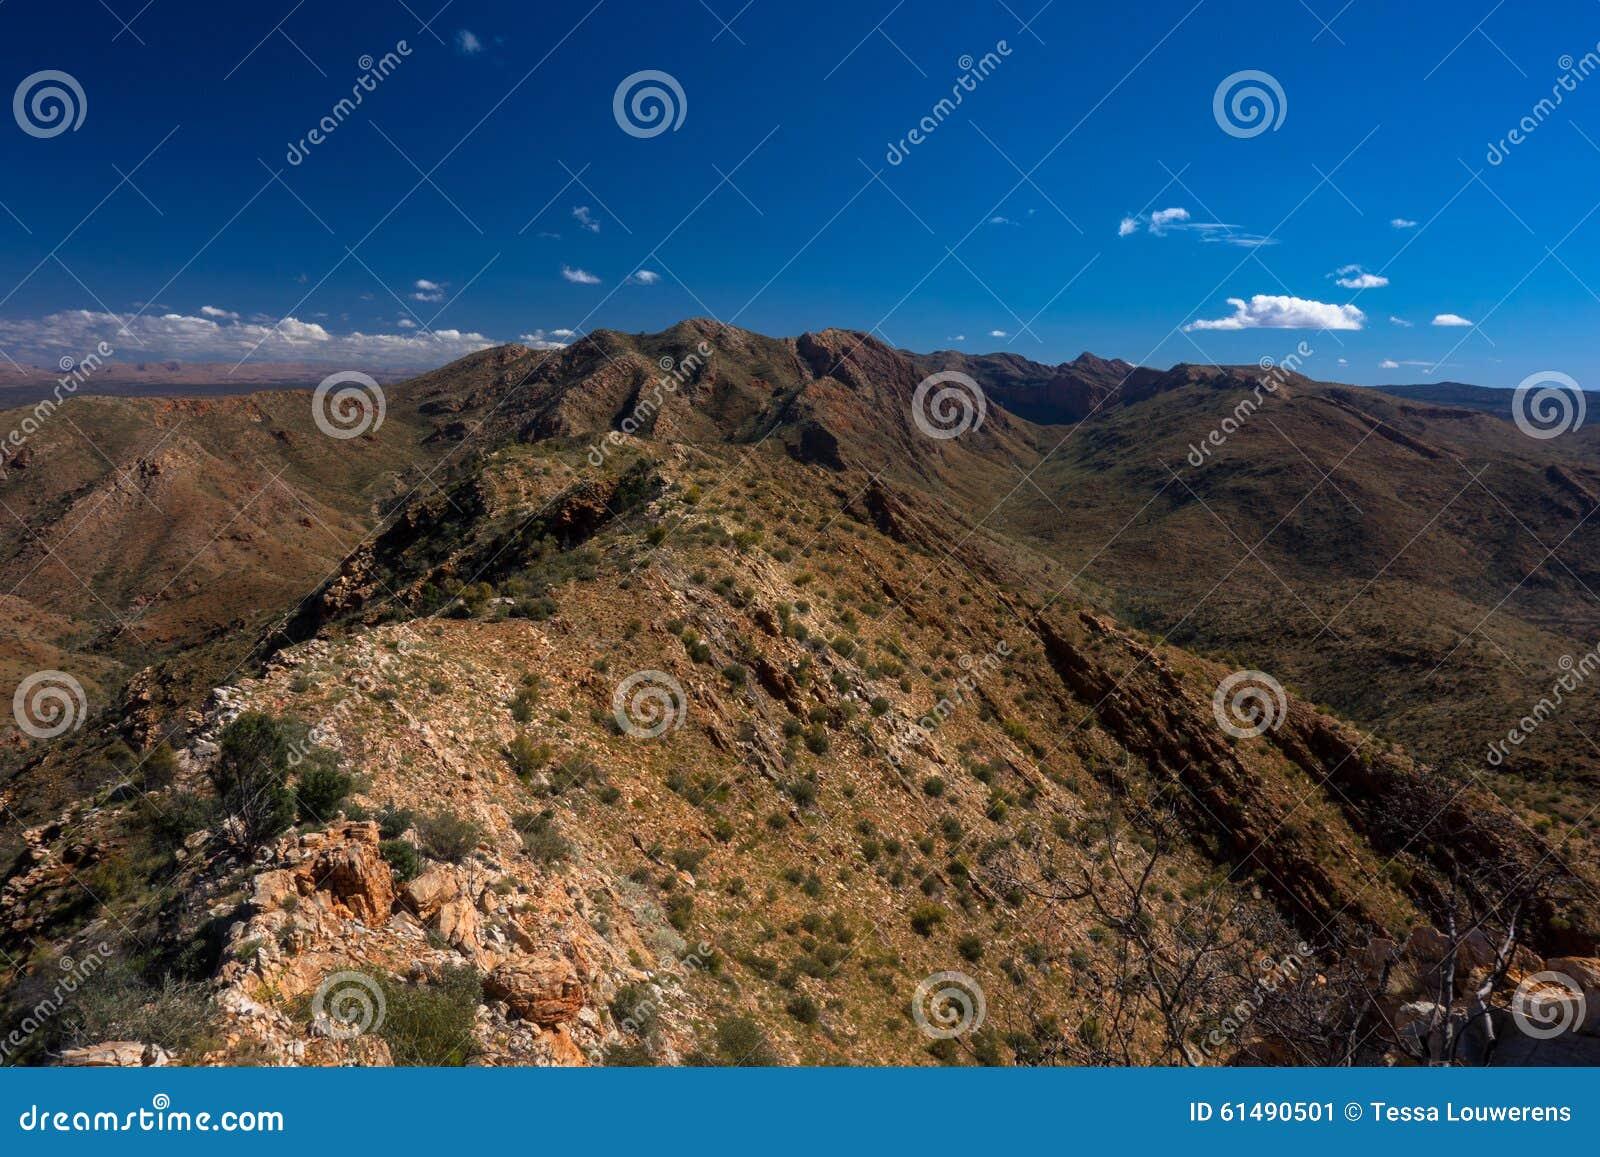 Larapinta Trail The Razorback Ridge West Macdonnell